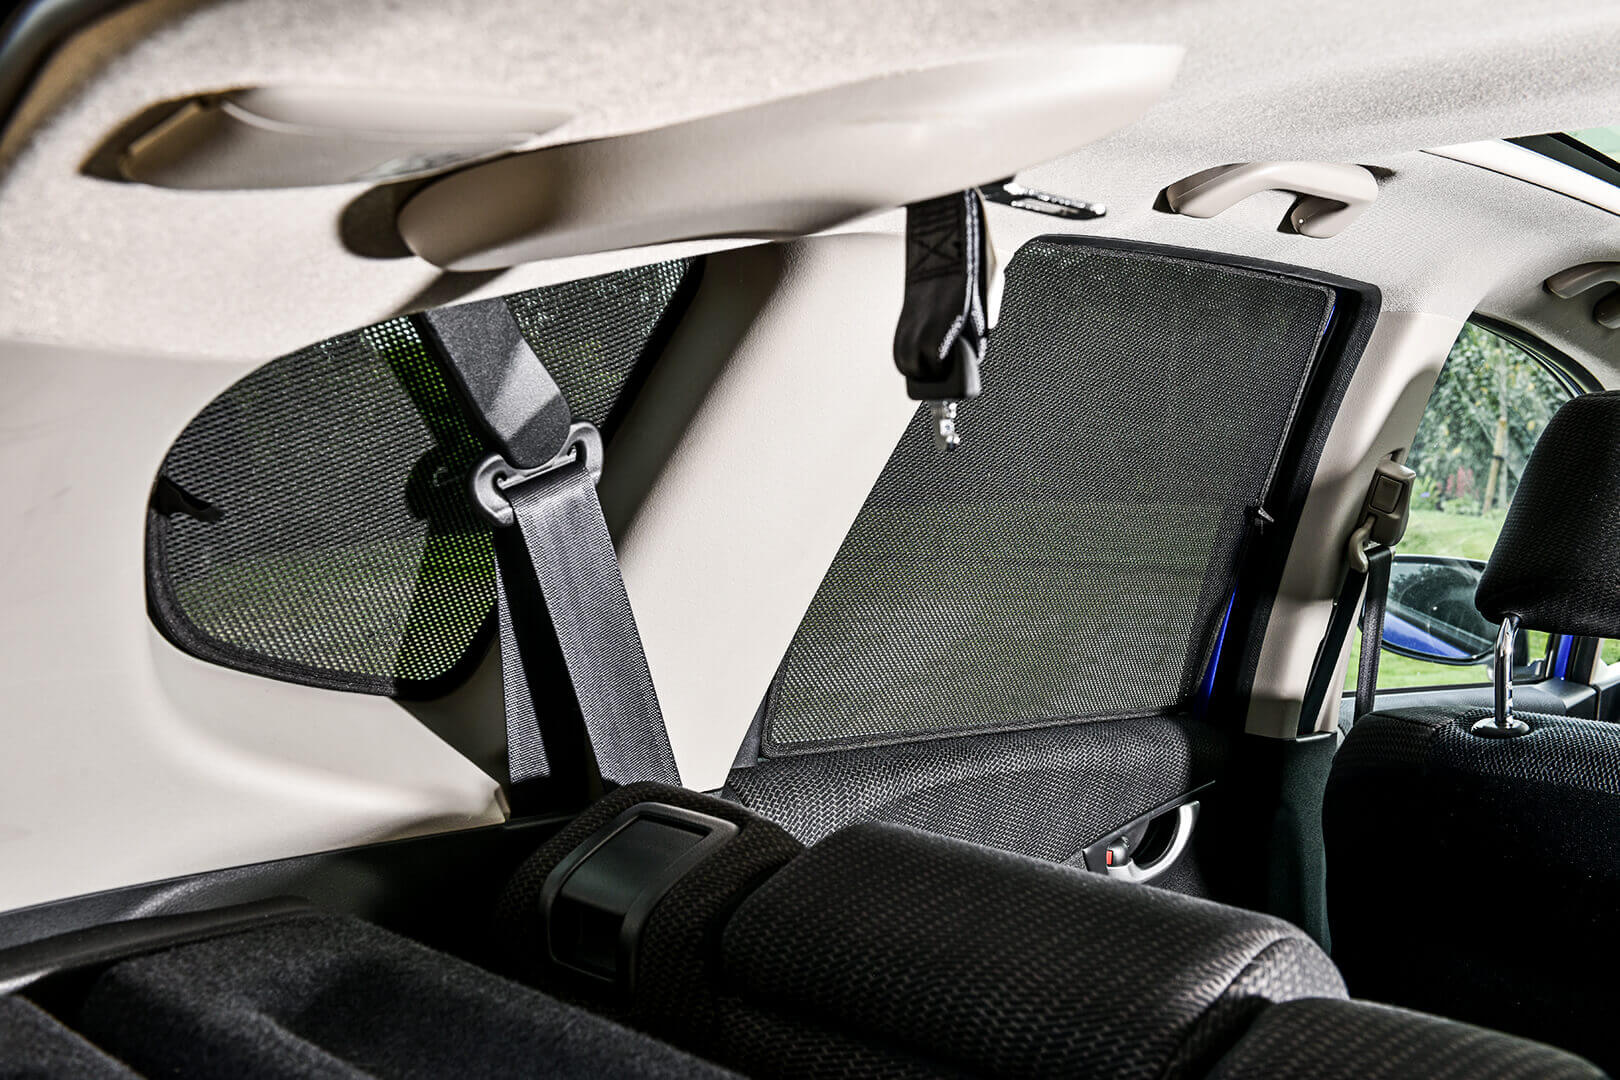 UV Privacy Car Shades (Set of 6) Honda JAZZ 5 DOOR 2008-2014